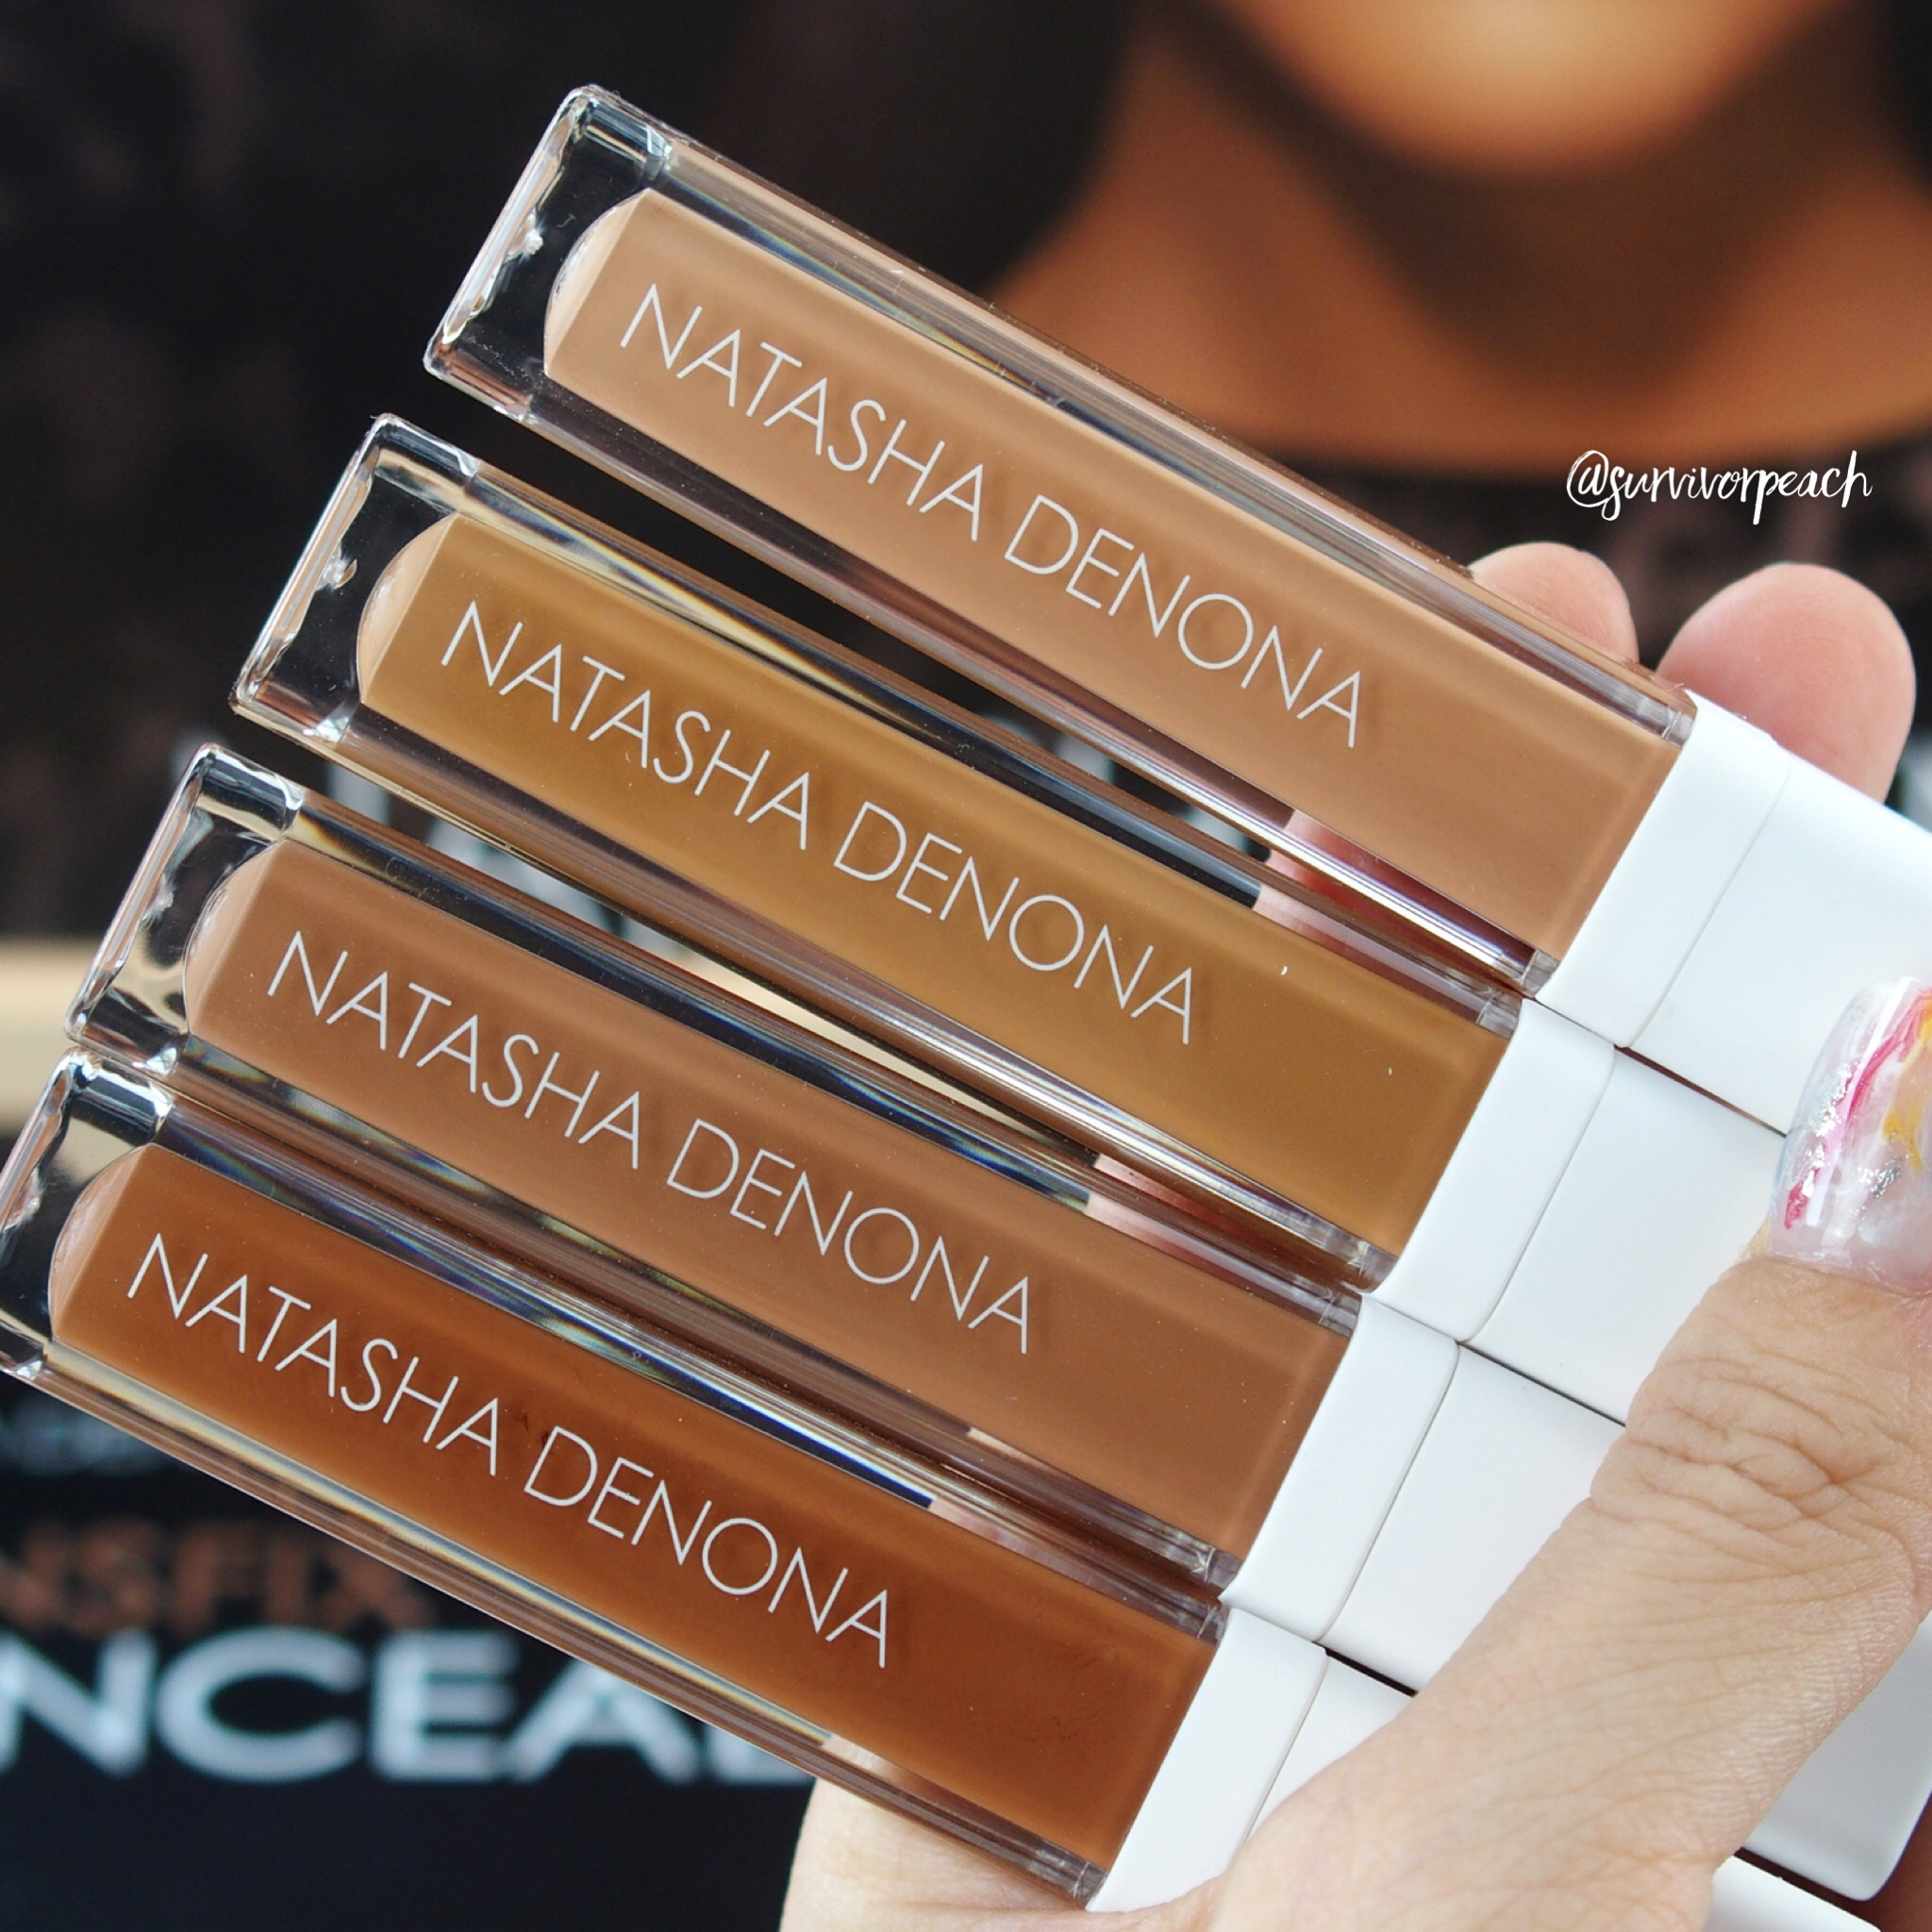 Natasha Denona Transfix Matte Concealers - 18WY Warm Yellow, 19N Neutral, 20W Warm